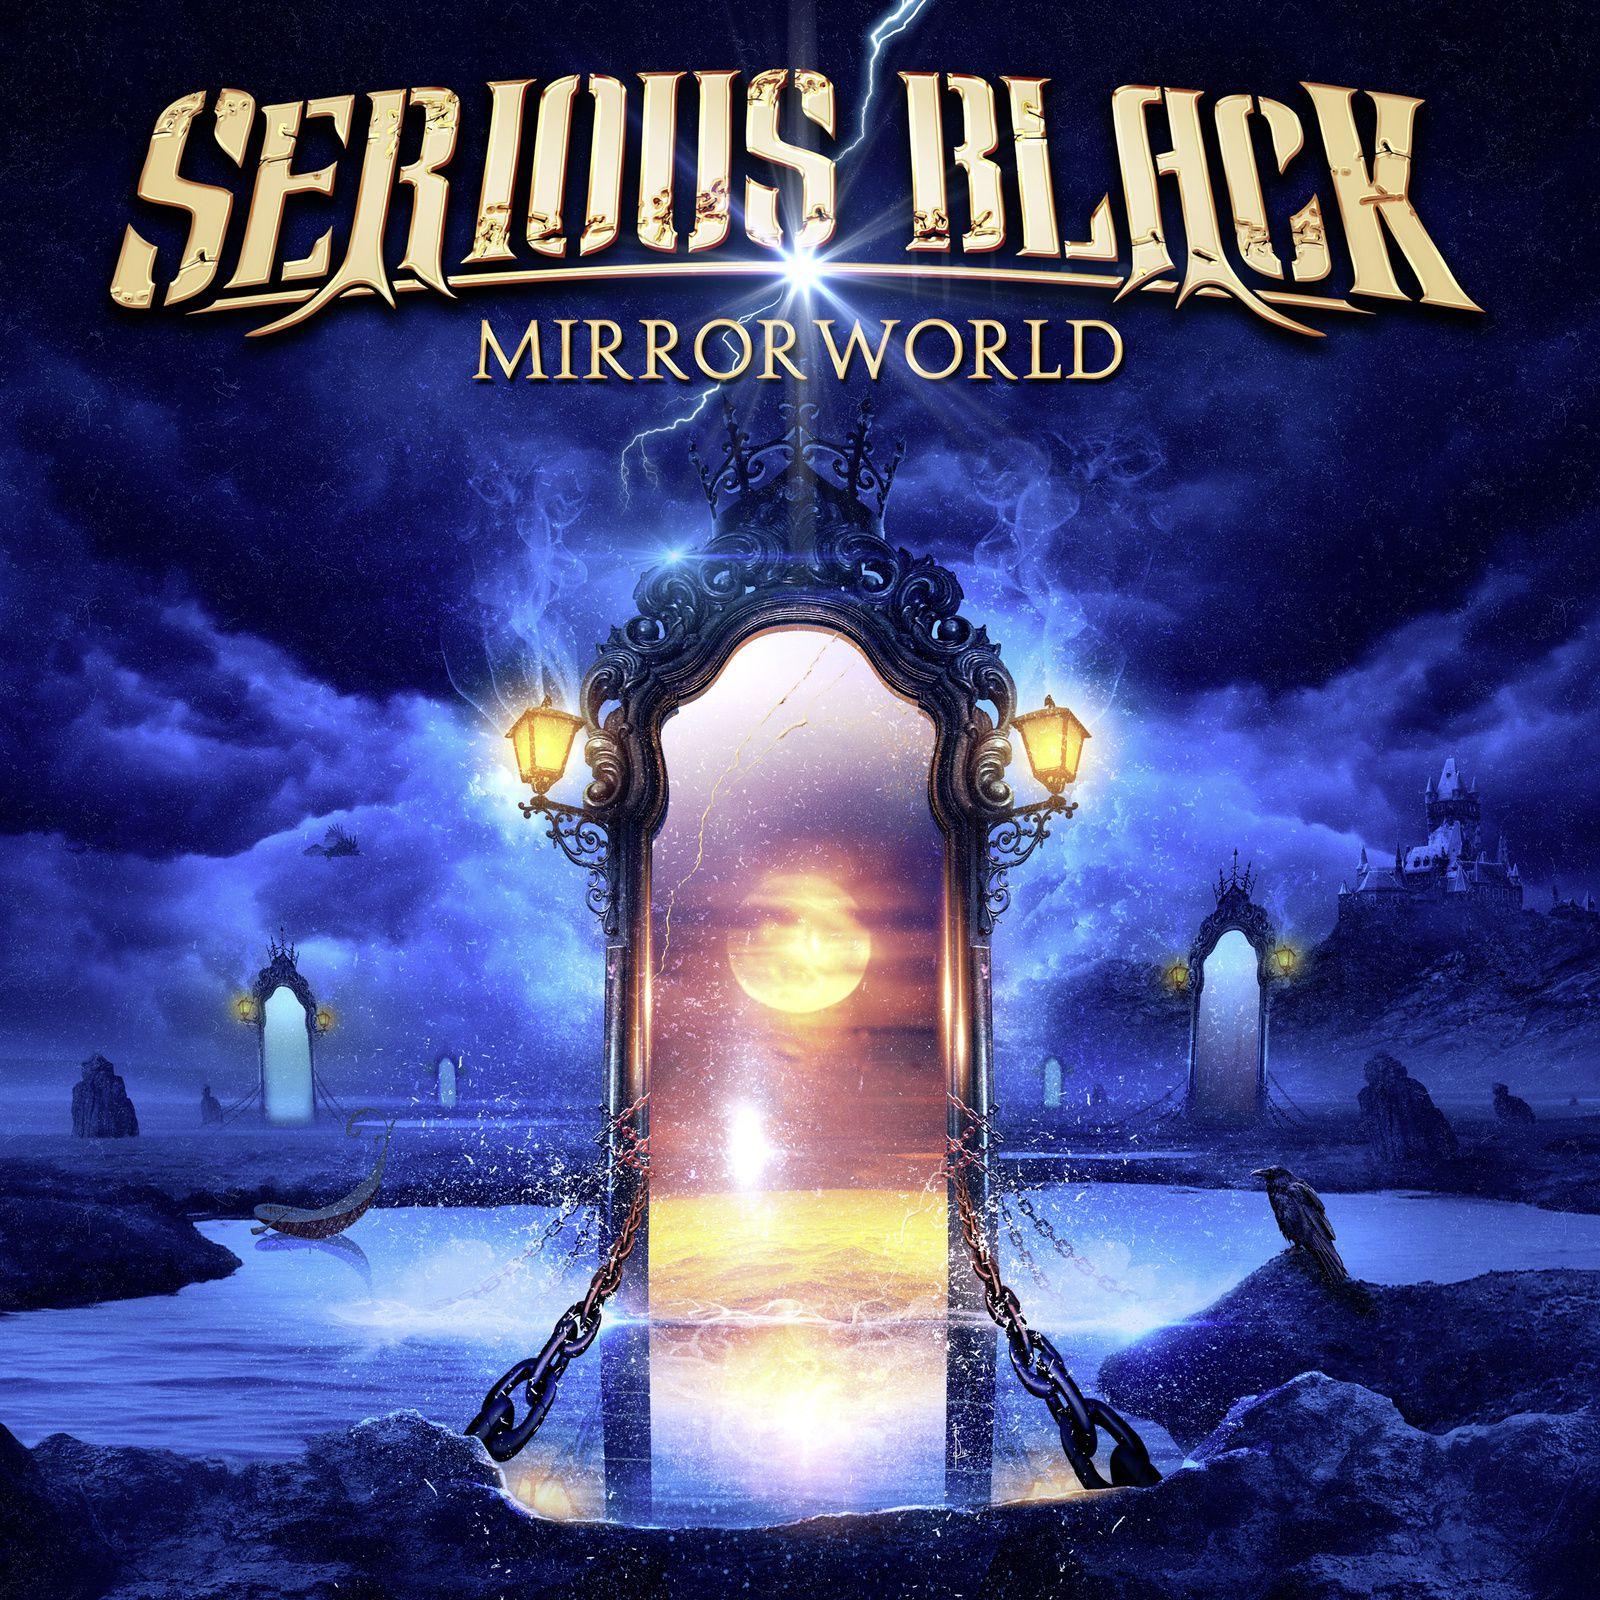 CD review SERIOUS BLACK &quot&#x3B;Mirrorworld&quot&#x3B;